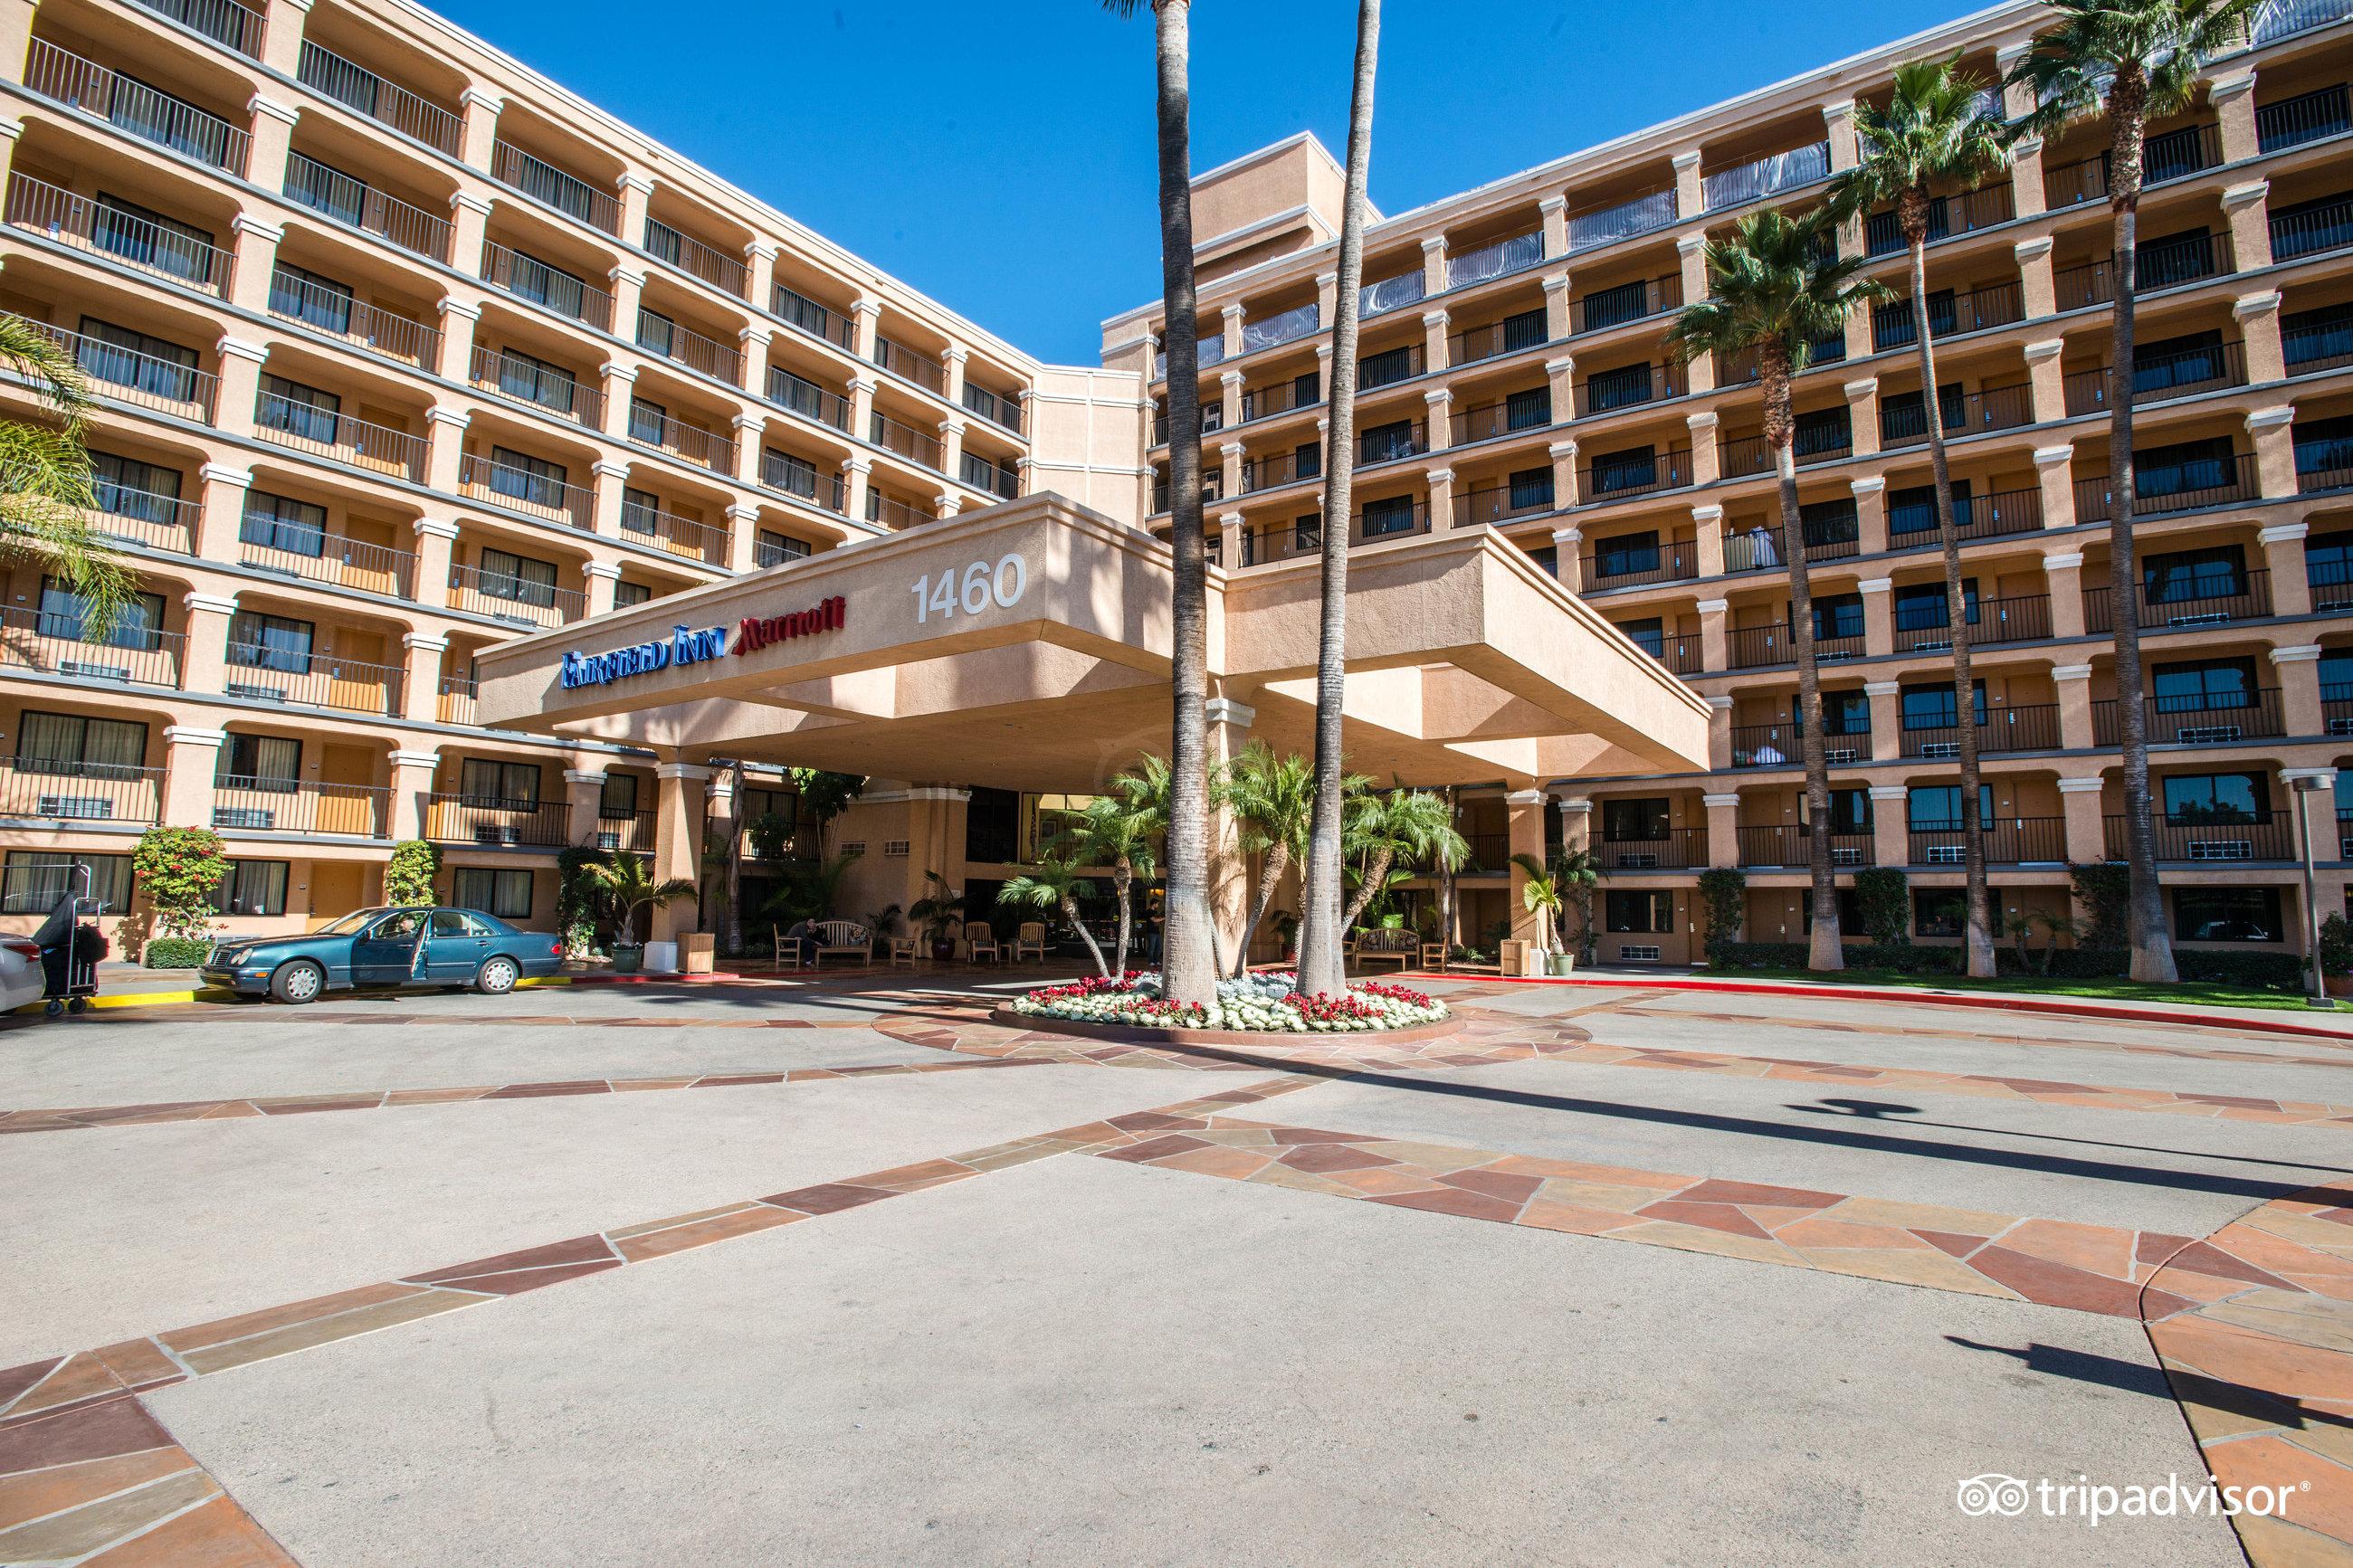 Fairfield Inn Anaheim Disneyland Resort CA 2018 Review  : street v11520127 from www.familyvacationcritic.com size 2600 x 1733 jpeg 1468kB